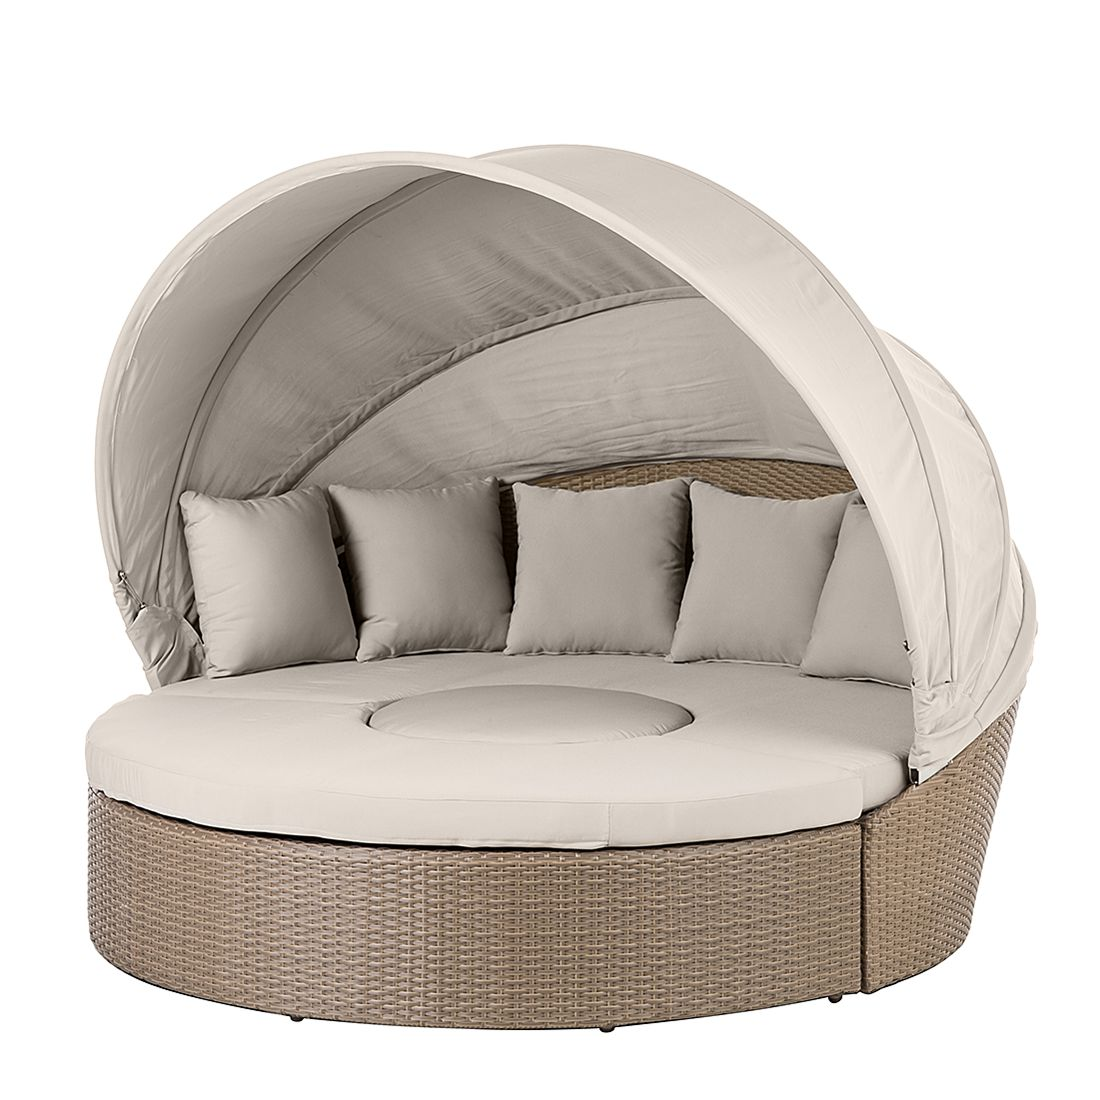 polyrattan sonneninsel preis vergleich 2016. Black Bedroom Furniture Sets. Home Design Ideas